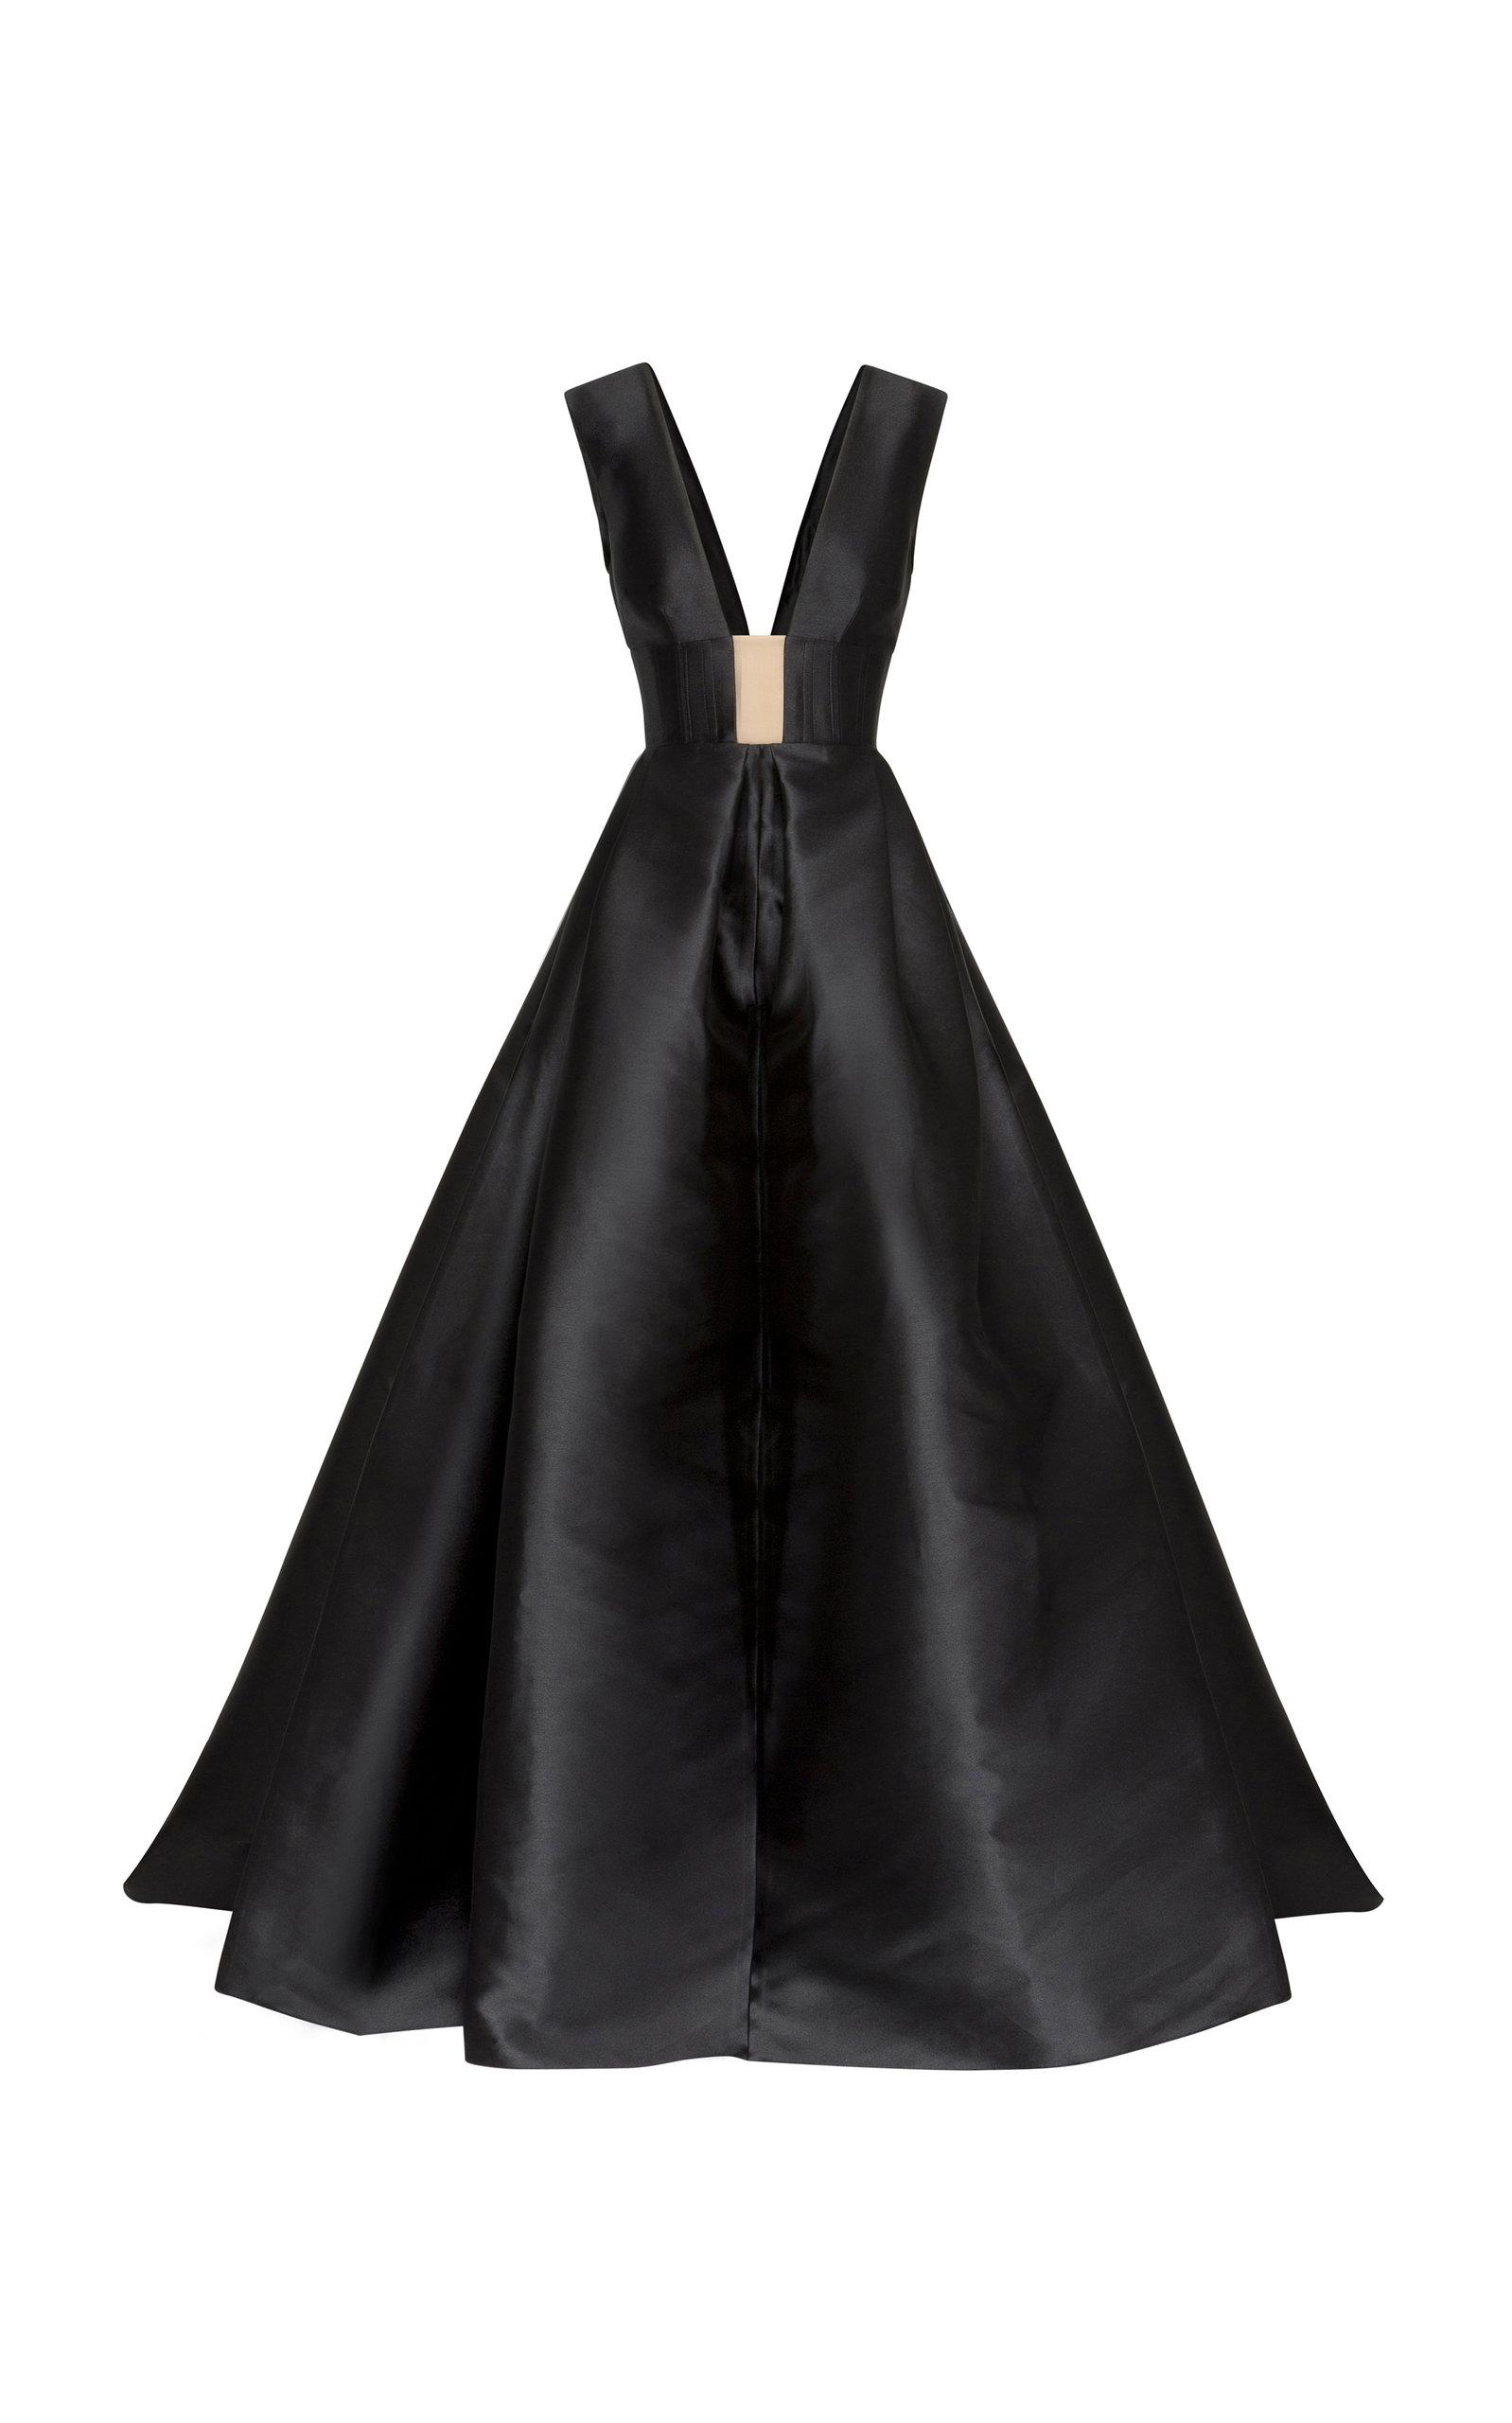 Axel Italian Silk Ball Gown